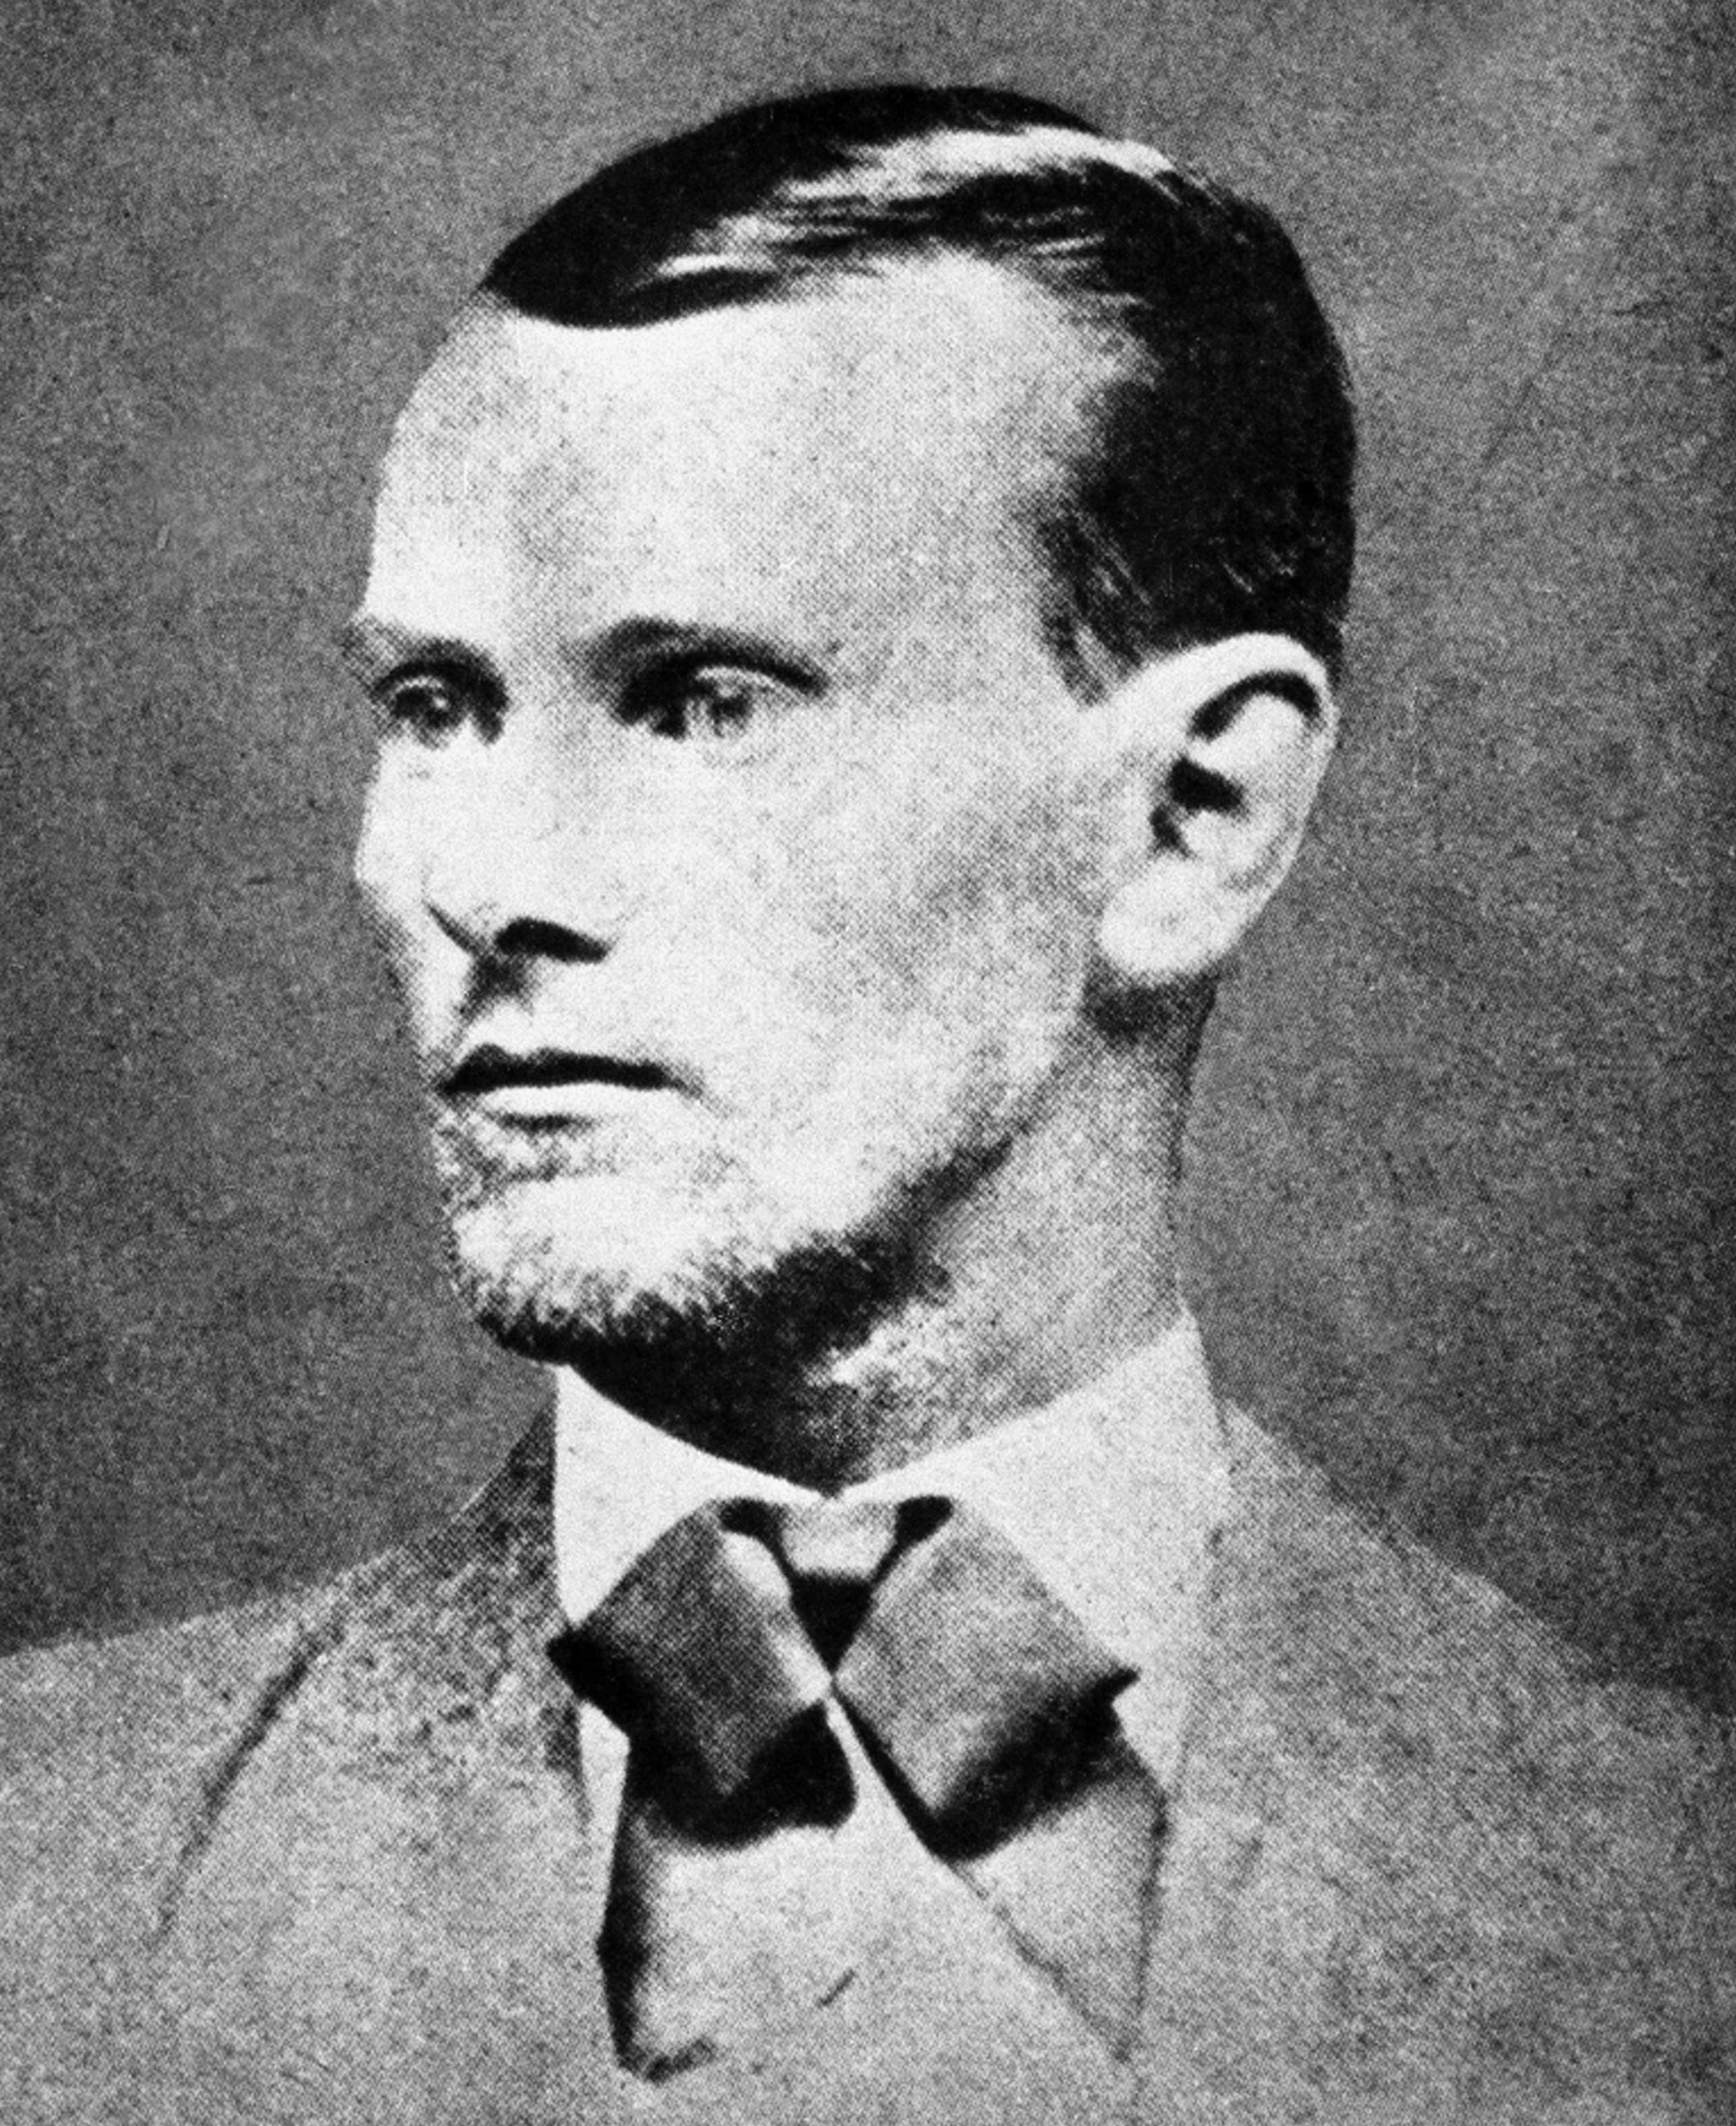 Image result for jesse james outlaw